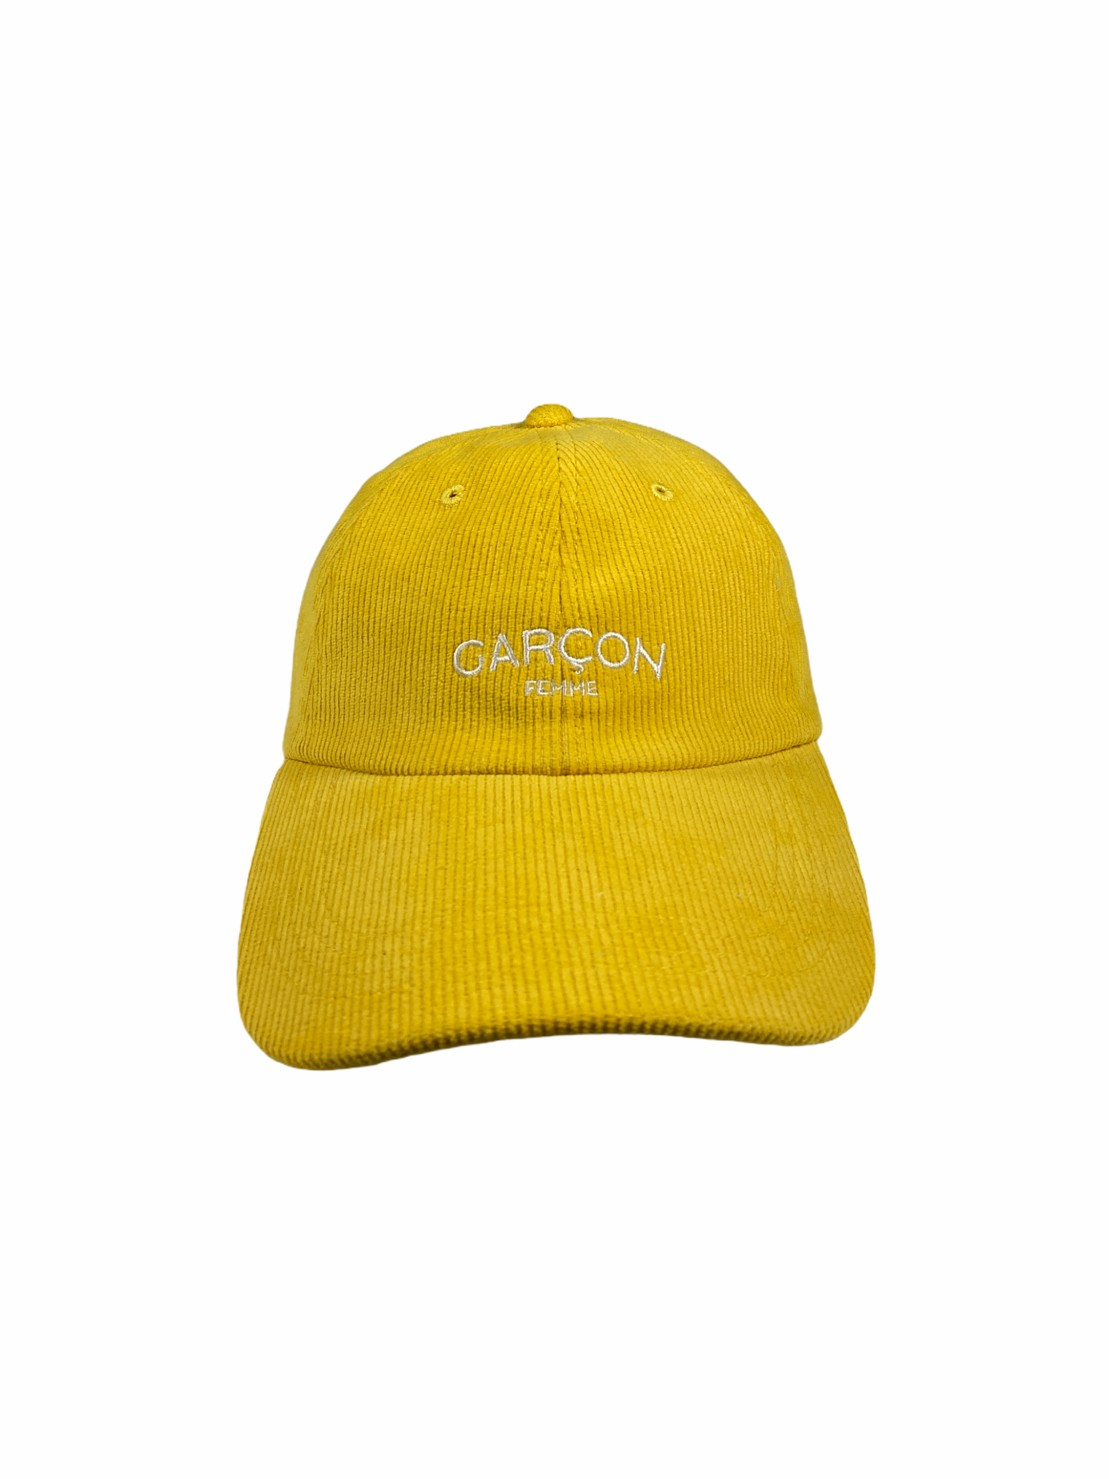 Garcon Cap - Femme (Lemon)